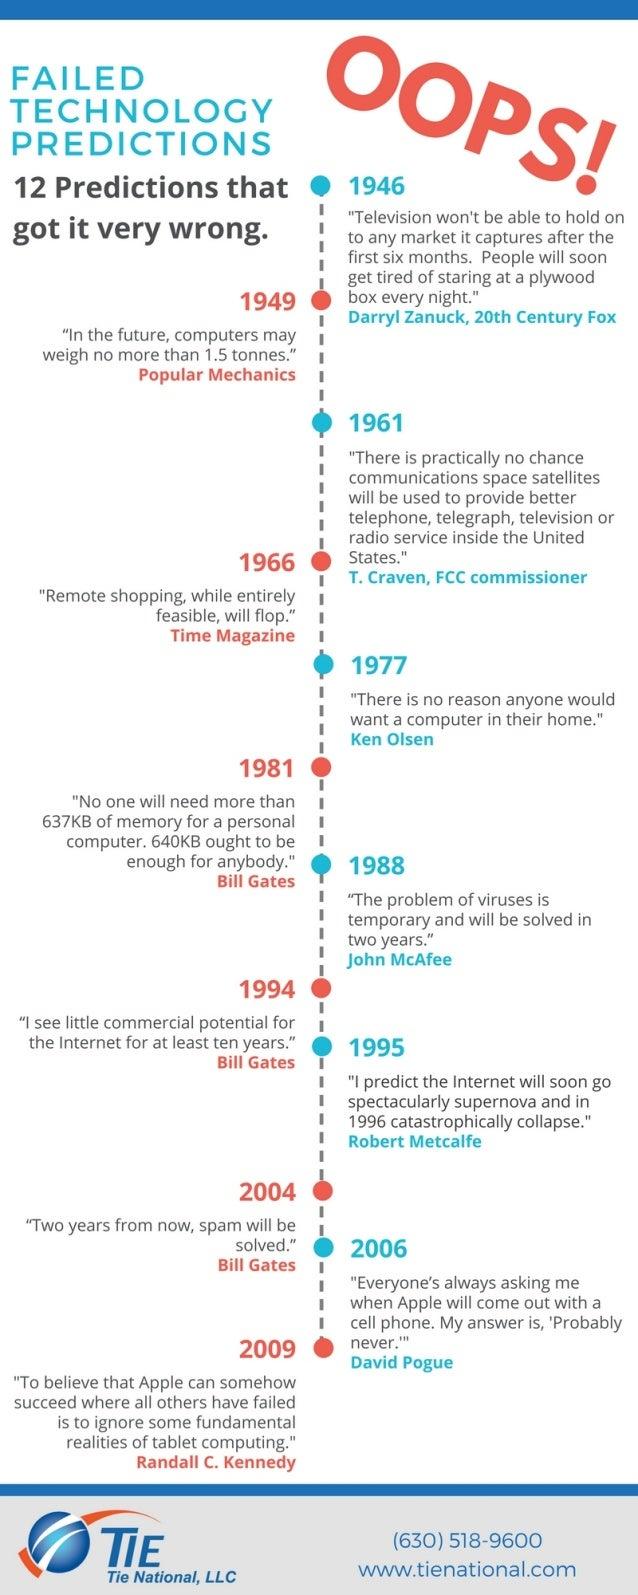 12 Failed Technology Predictions